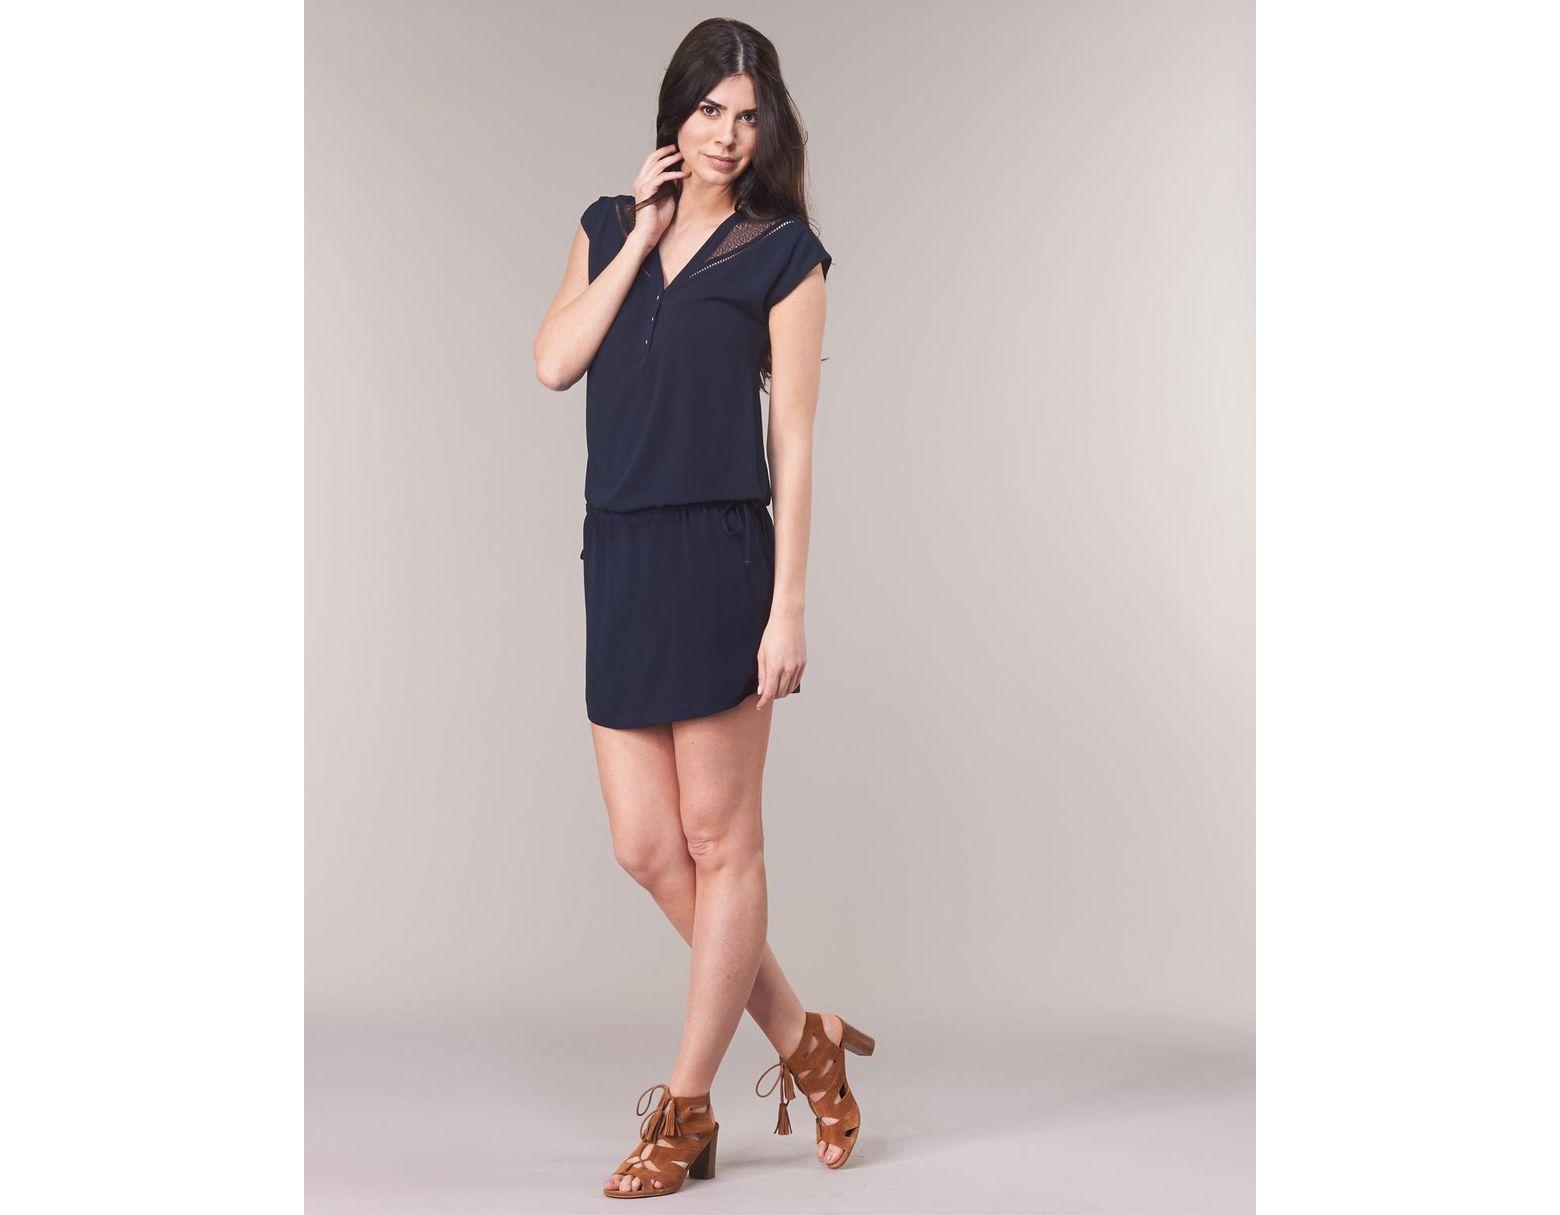 Nznop8kx0w Lyst En 49 Robe Bleu Femmes Ikks Coloris Bn30265 7yYfIvb6gm